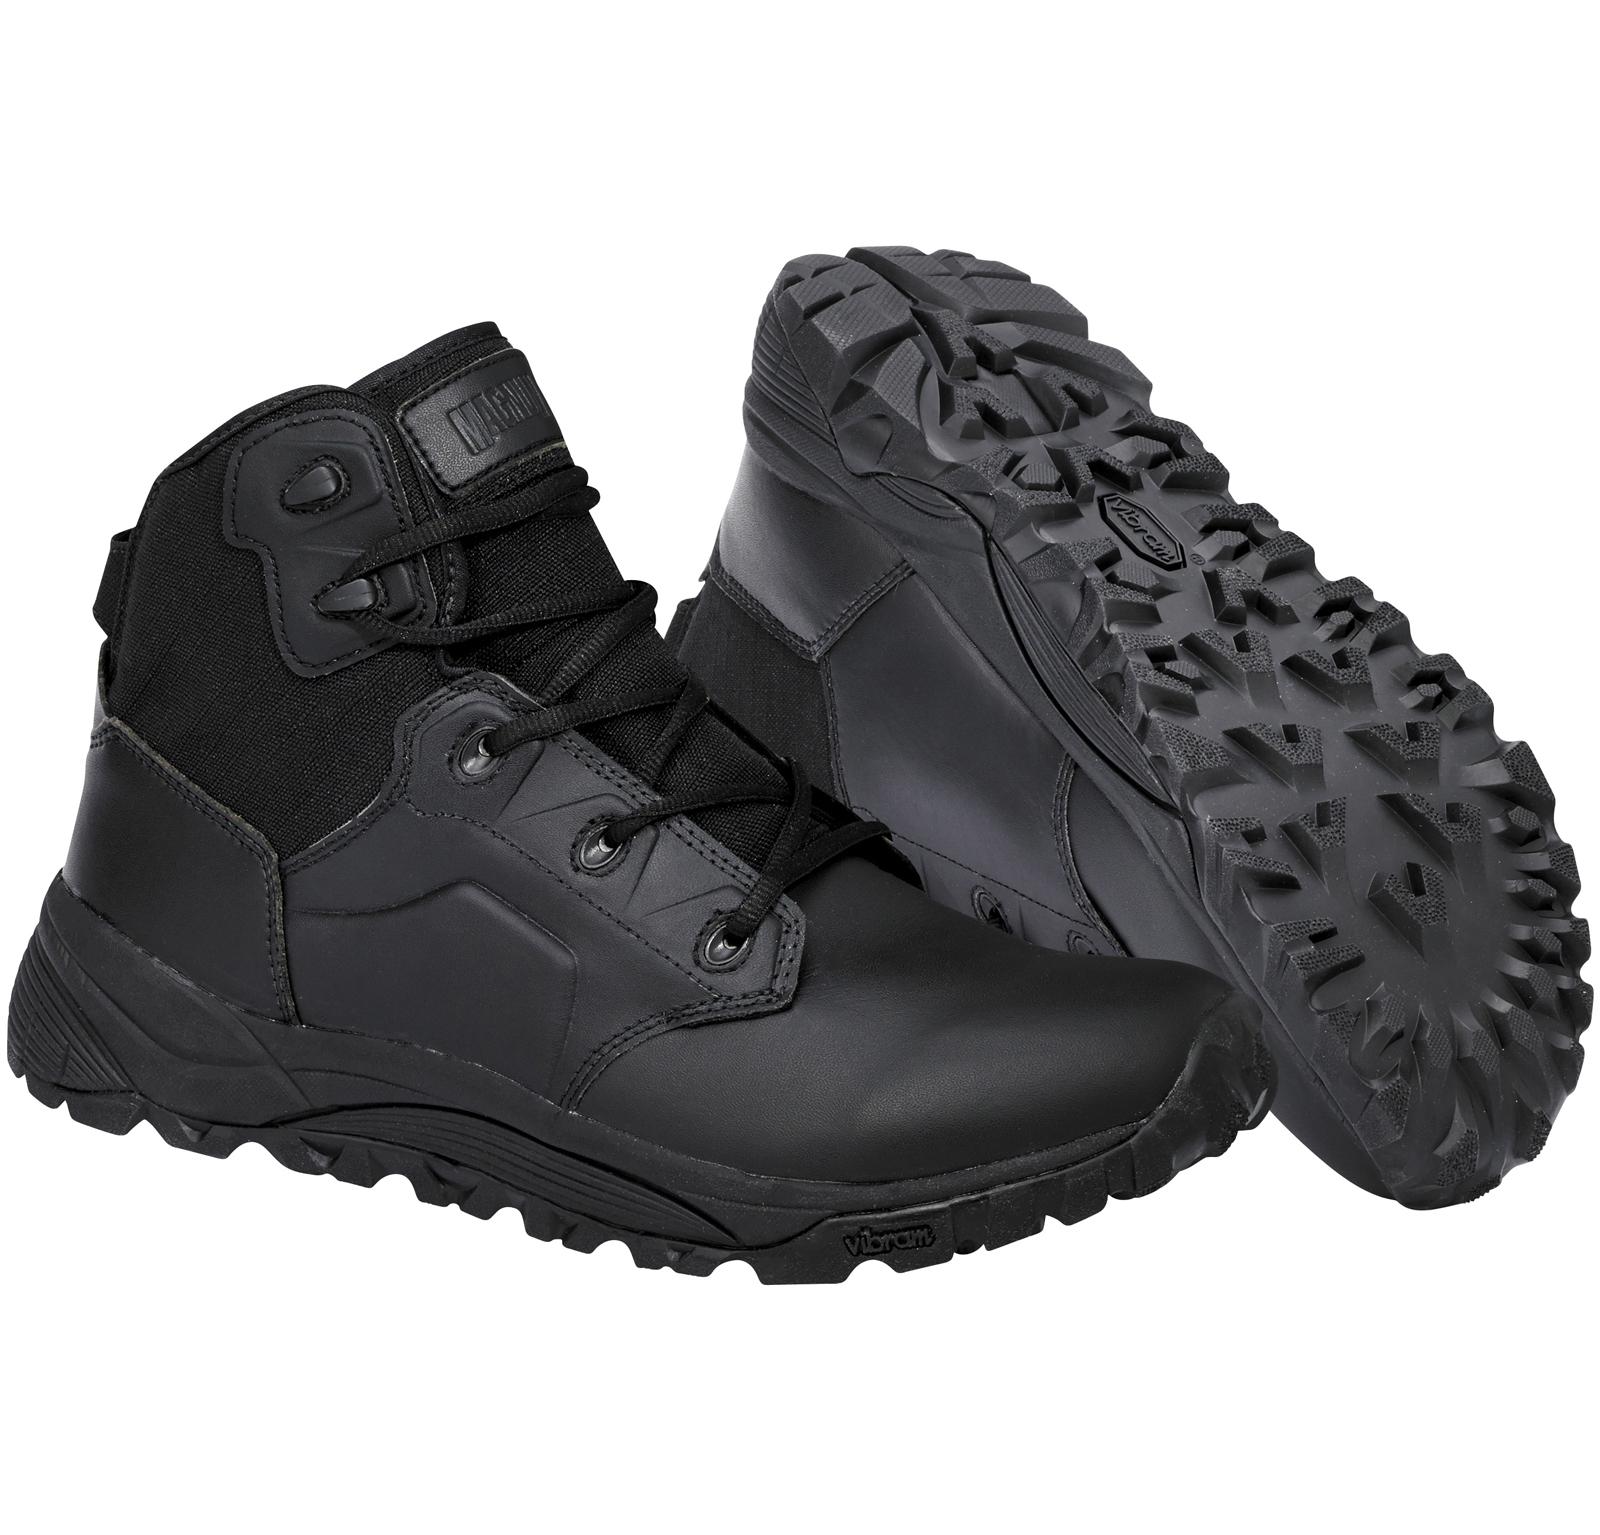 New Mens Magnum MACH 2 5.0 Black Lightweight Combat Police Ankle Boots Size 6-14 | EBay